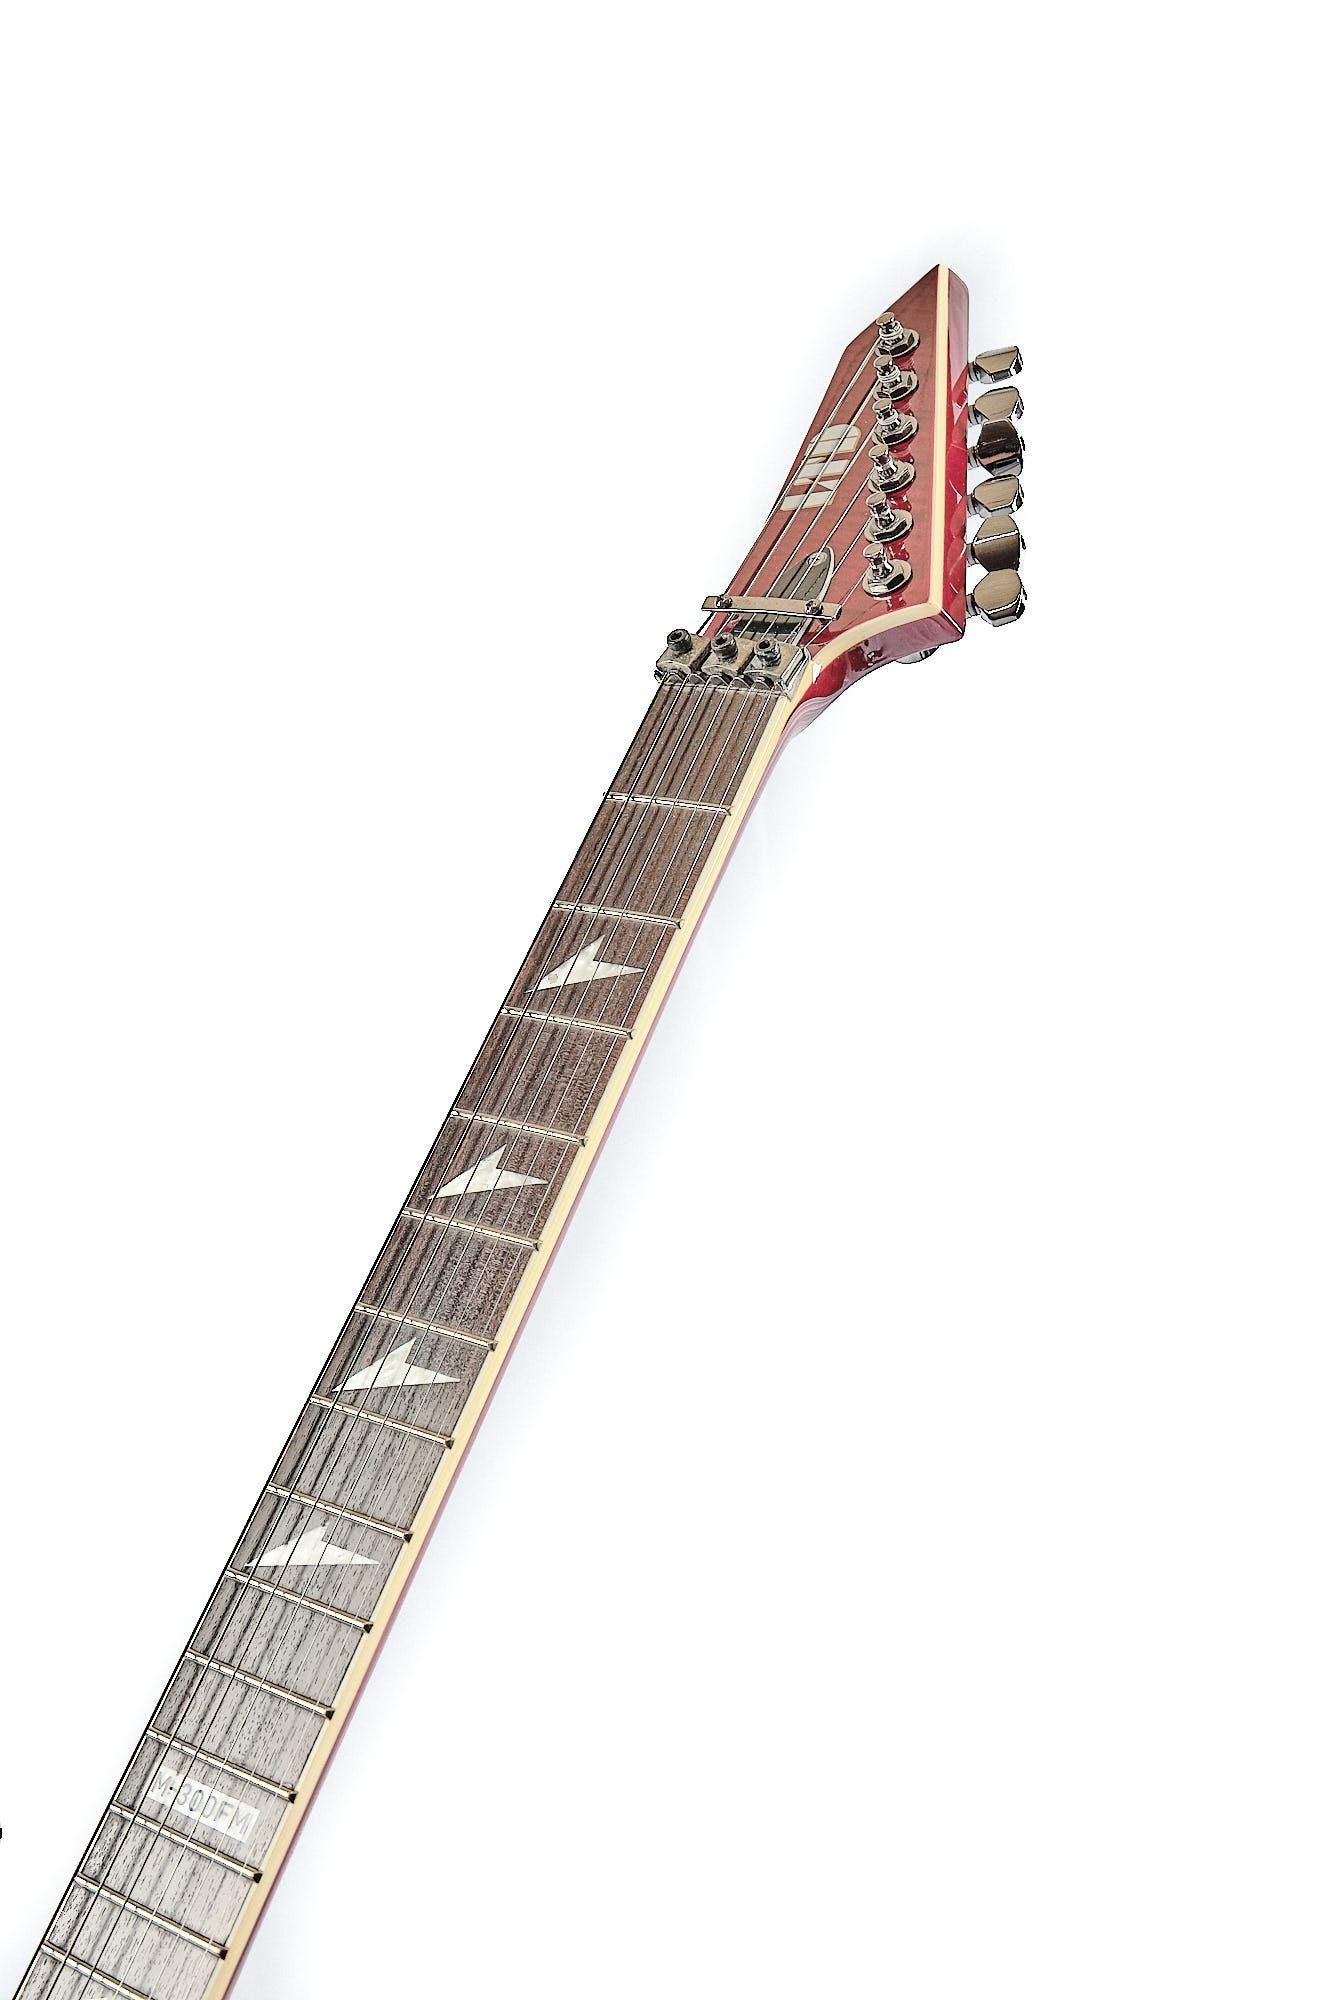 Guitarra Esp Ltd M-300 Fm See Thru Black Cherry